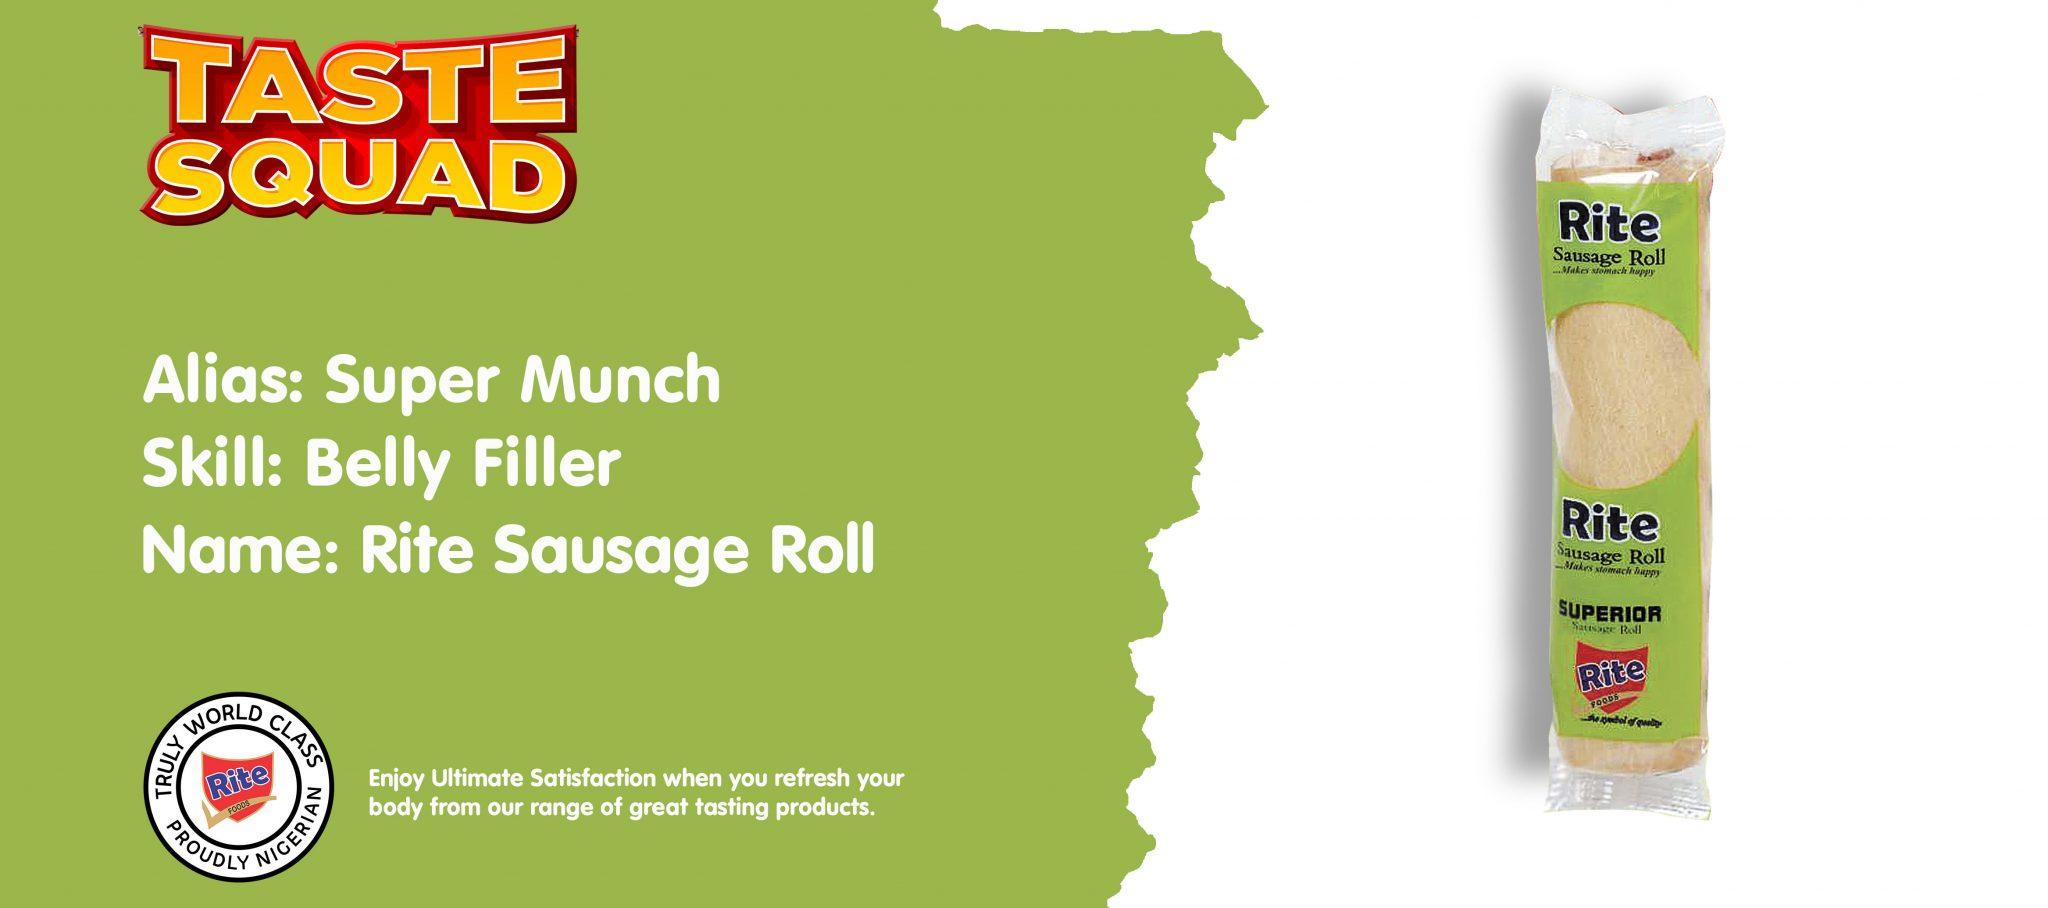 Rite Sausage Roll